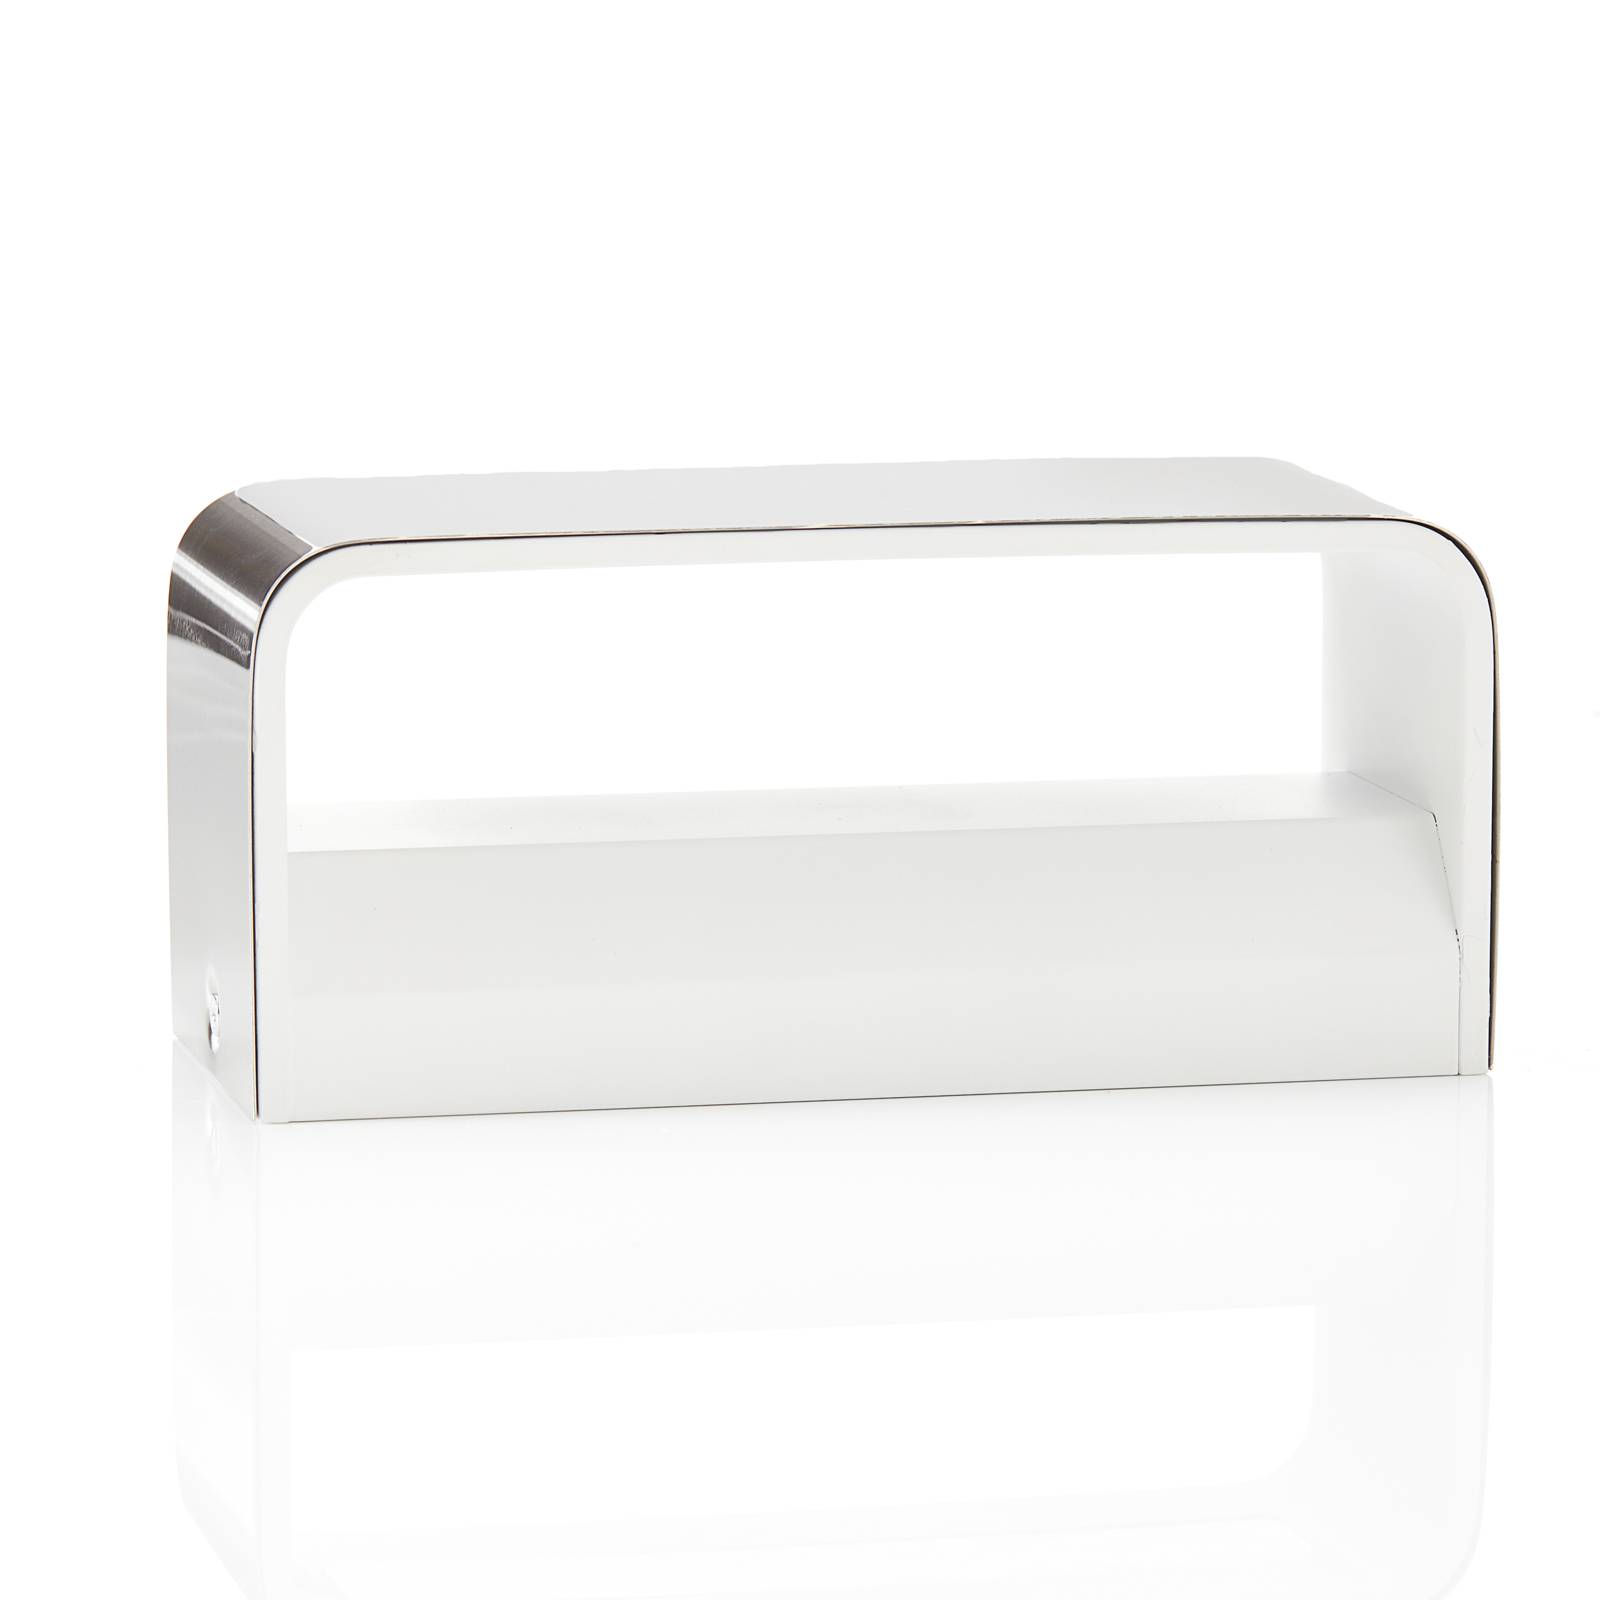 Lucande Sessa applique LED 20cm nickel mat